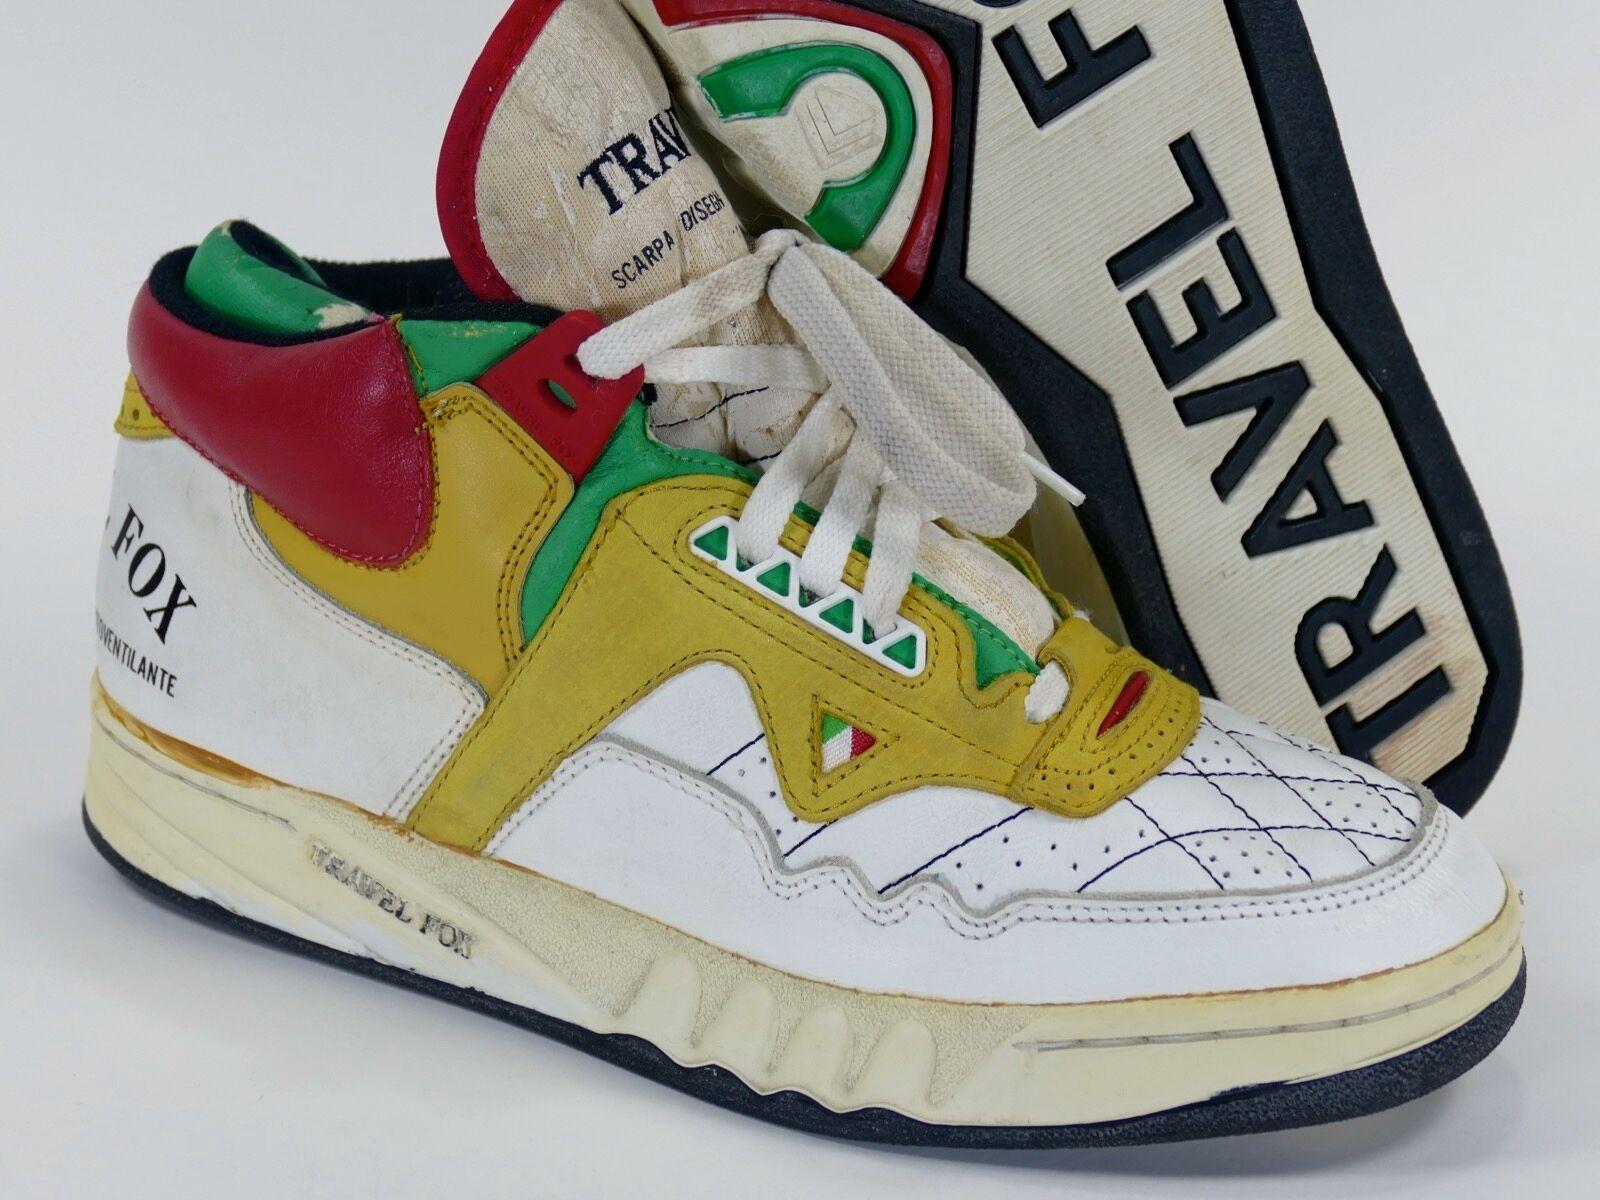 Vintage Nunca Usado viaje FOX Zapatos euro 43 US 9.5 - UK tropa Spx 80s 90s 1980s